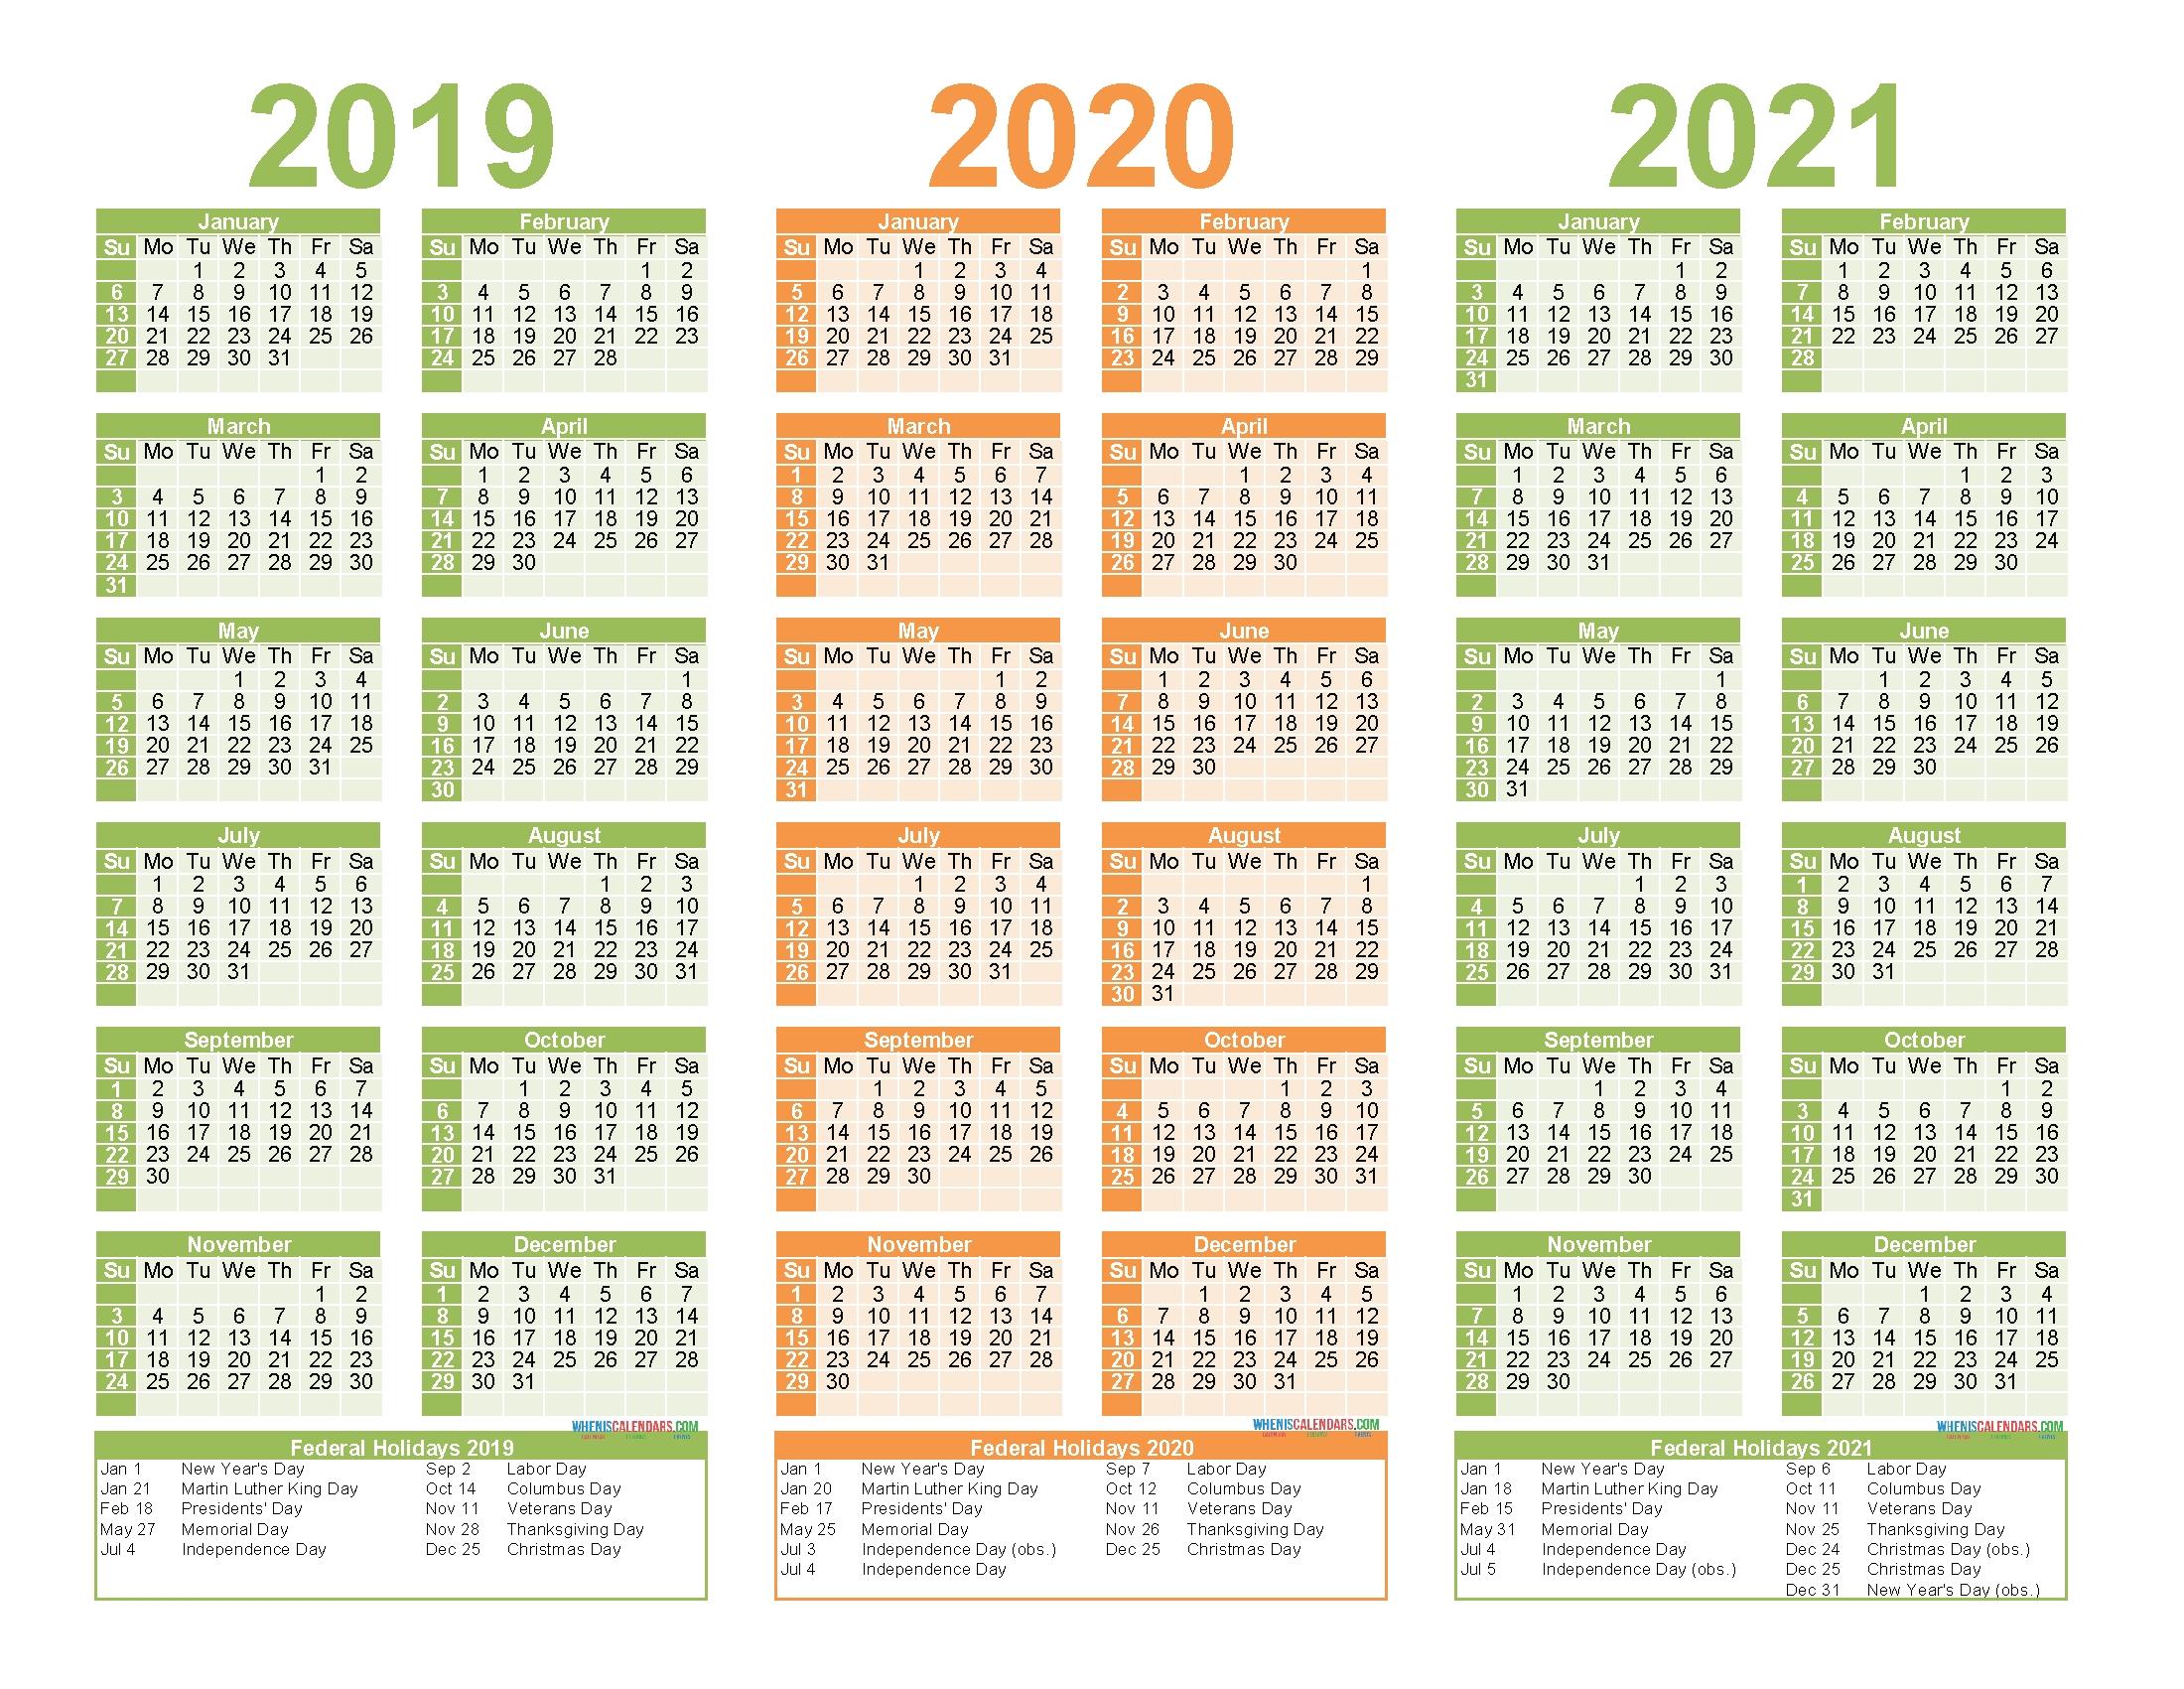 2019 To 2021 Calendar Printable Free Pdf, Word, Image | Free within Three-Year Calendar 2019 2020 2021